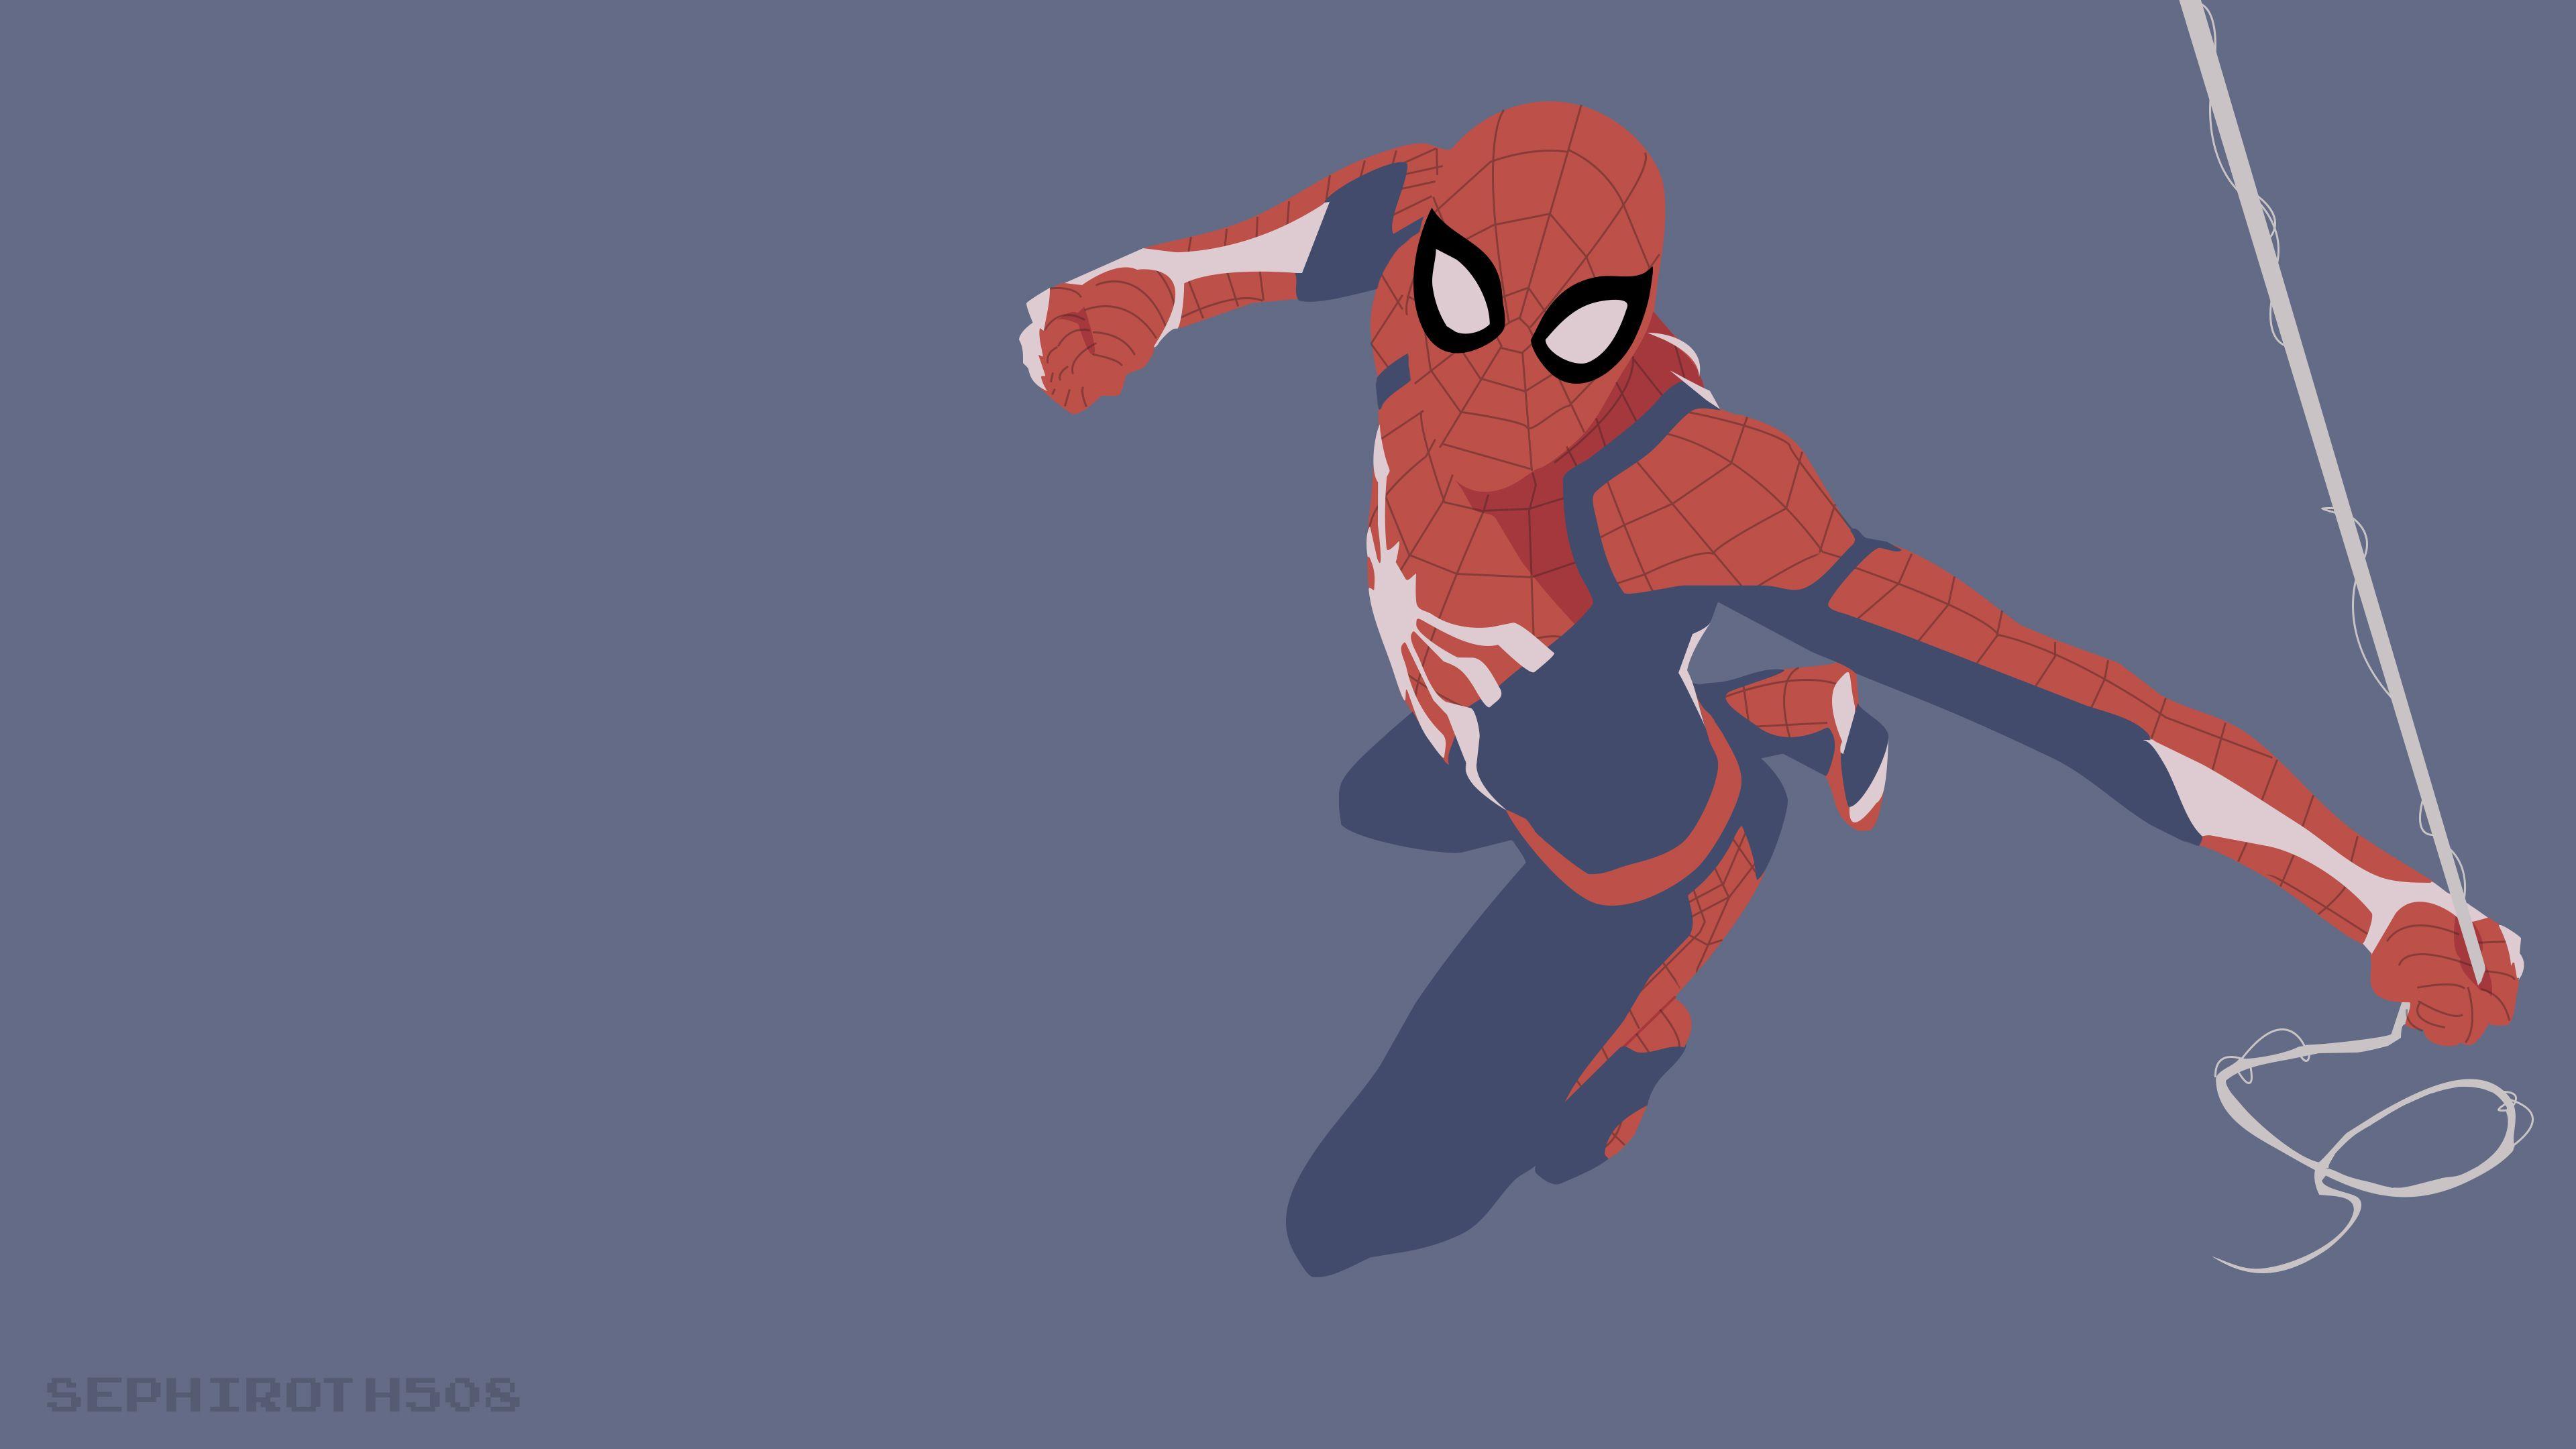 Spiderman Ps4 Minimalist Superheroes Wallpapers Spiderman Wallpapers Hd Wallpapers Deviantart Wallpapers Ar Spiderman Ps4 Spiderman Ps4 Wallpaper Spiderman